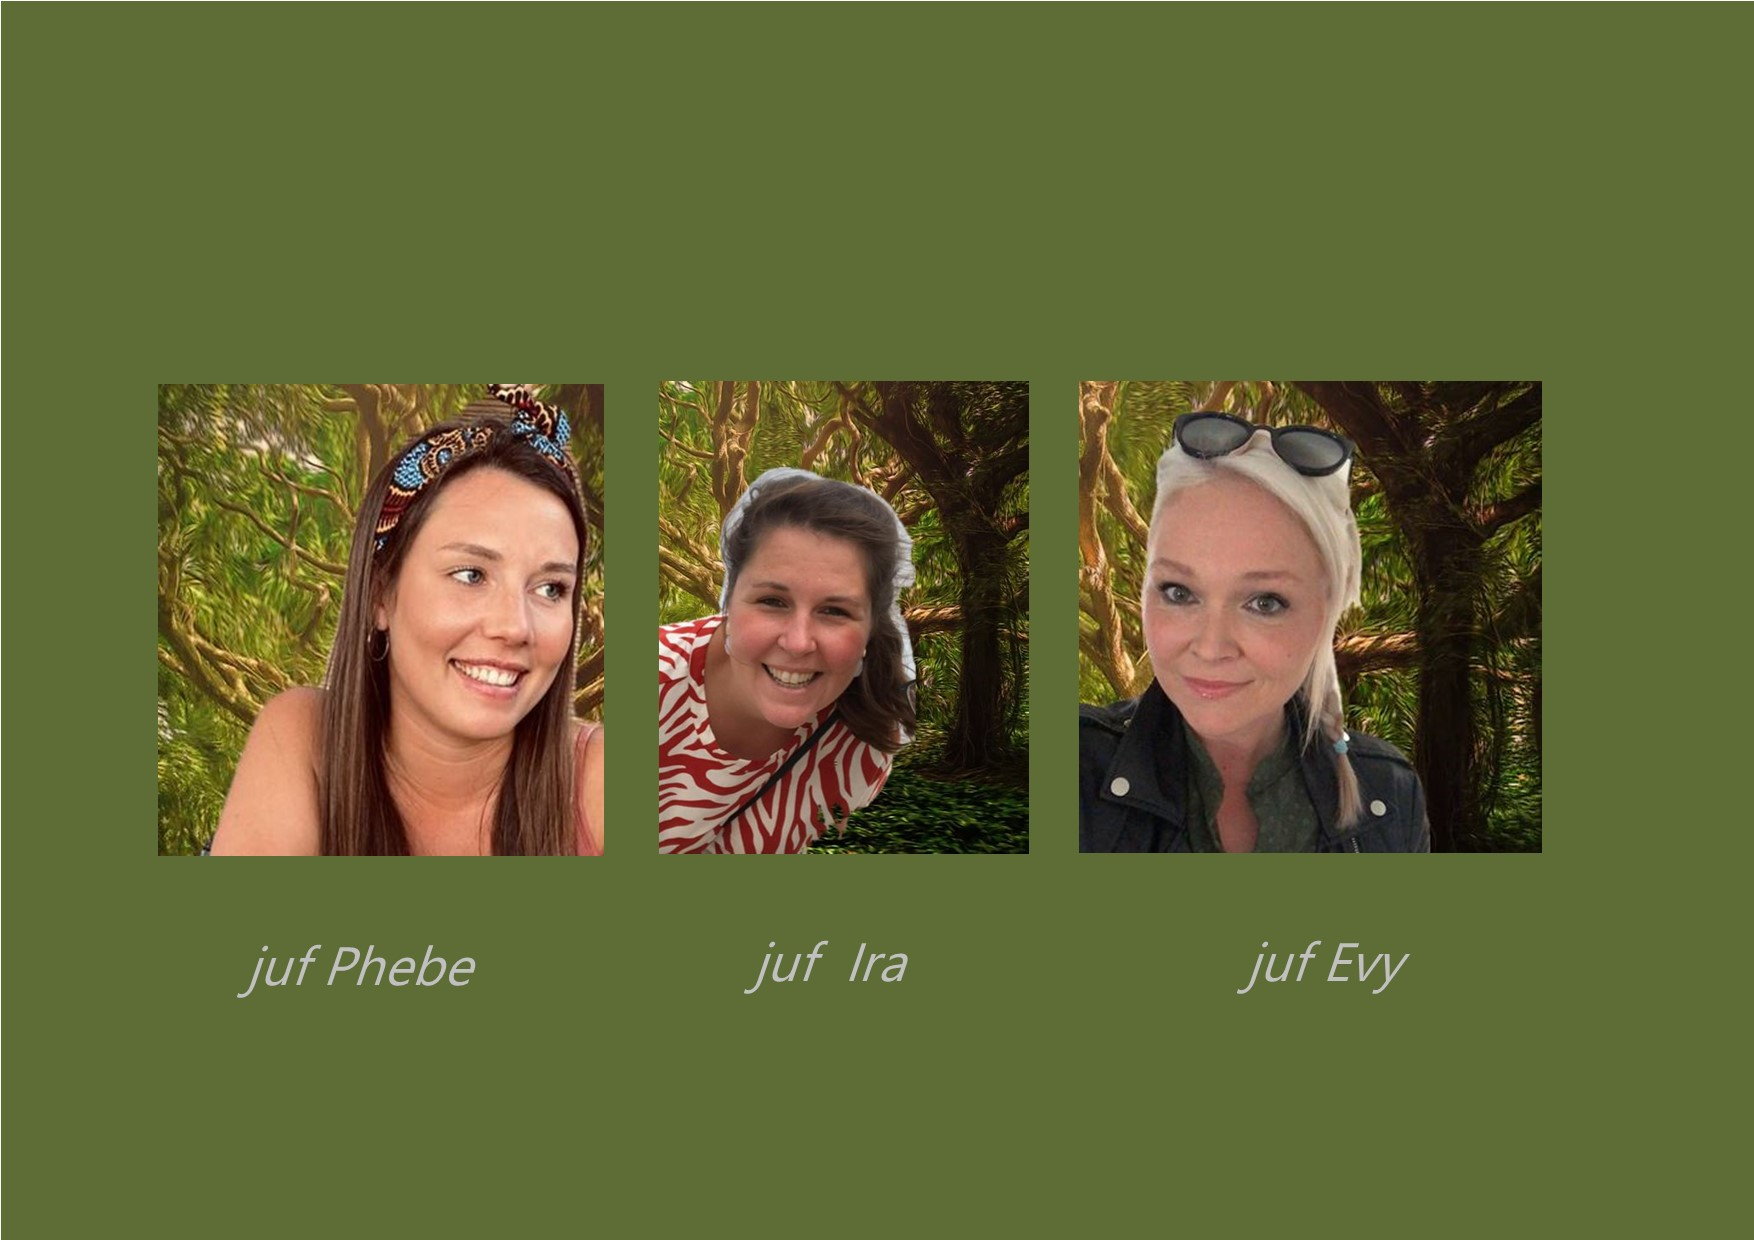 <p>eendjesklas: juf Phebe<br />co-teachers: juf Ira en juf Evy</p>